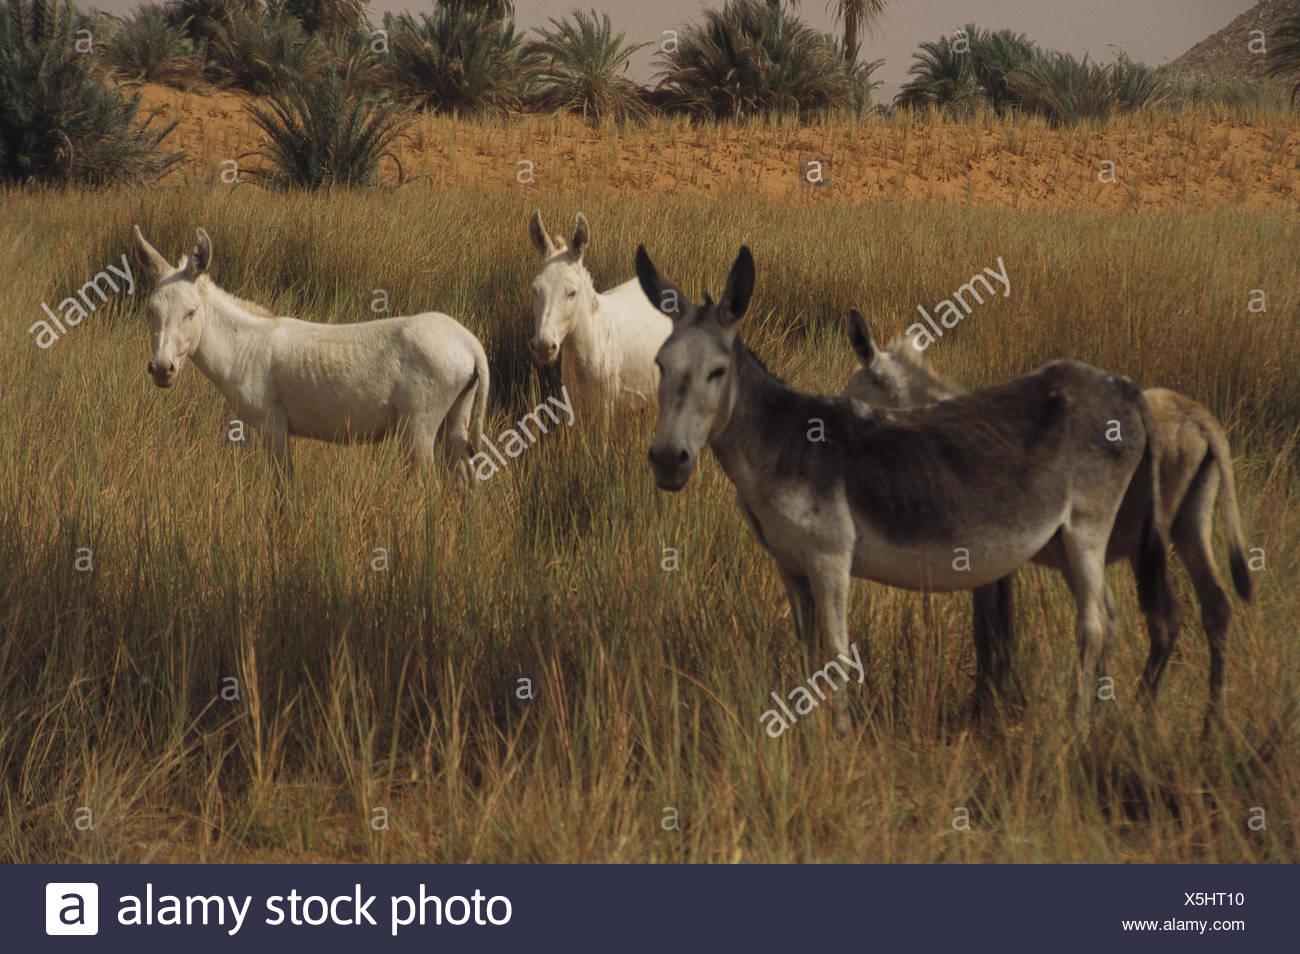 Chad, mesa country Ennedi, salt lake Ounianga Serir, west shore, donkey Central, Africa, landlocked country, Sahara, Sahara waters, lake, 381 m sea level, lakesides, beach, grass, animals, mammals, eat, nature, scenery - Stock Image